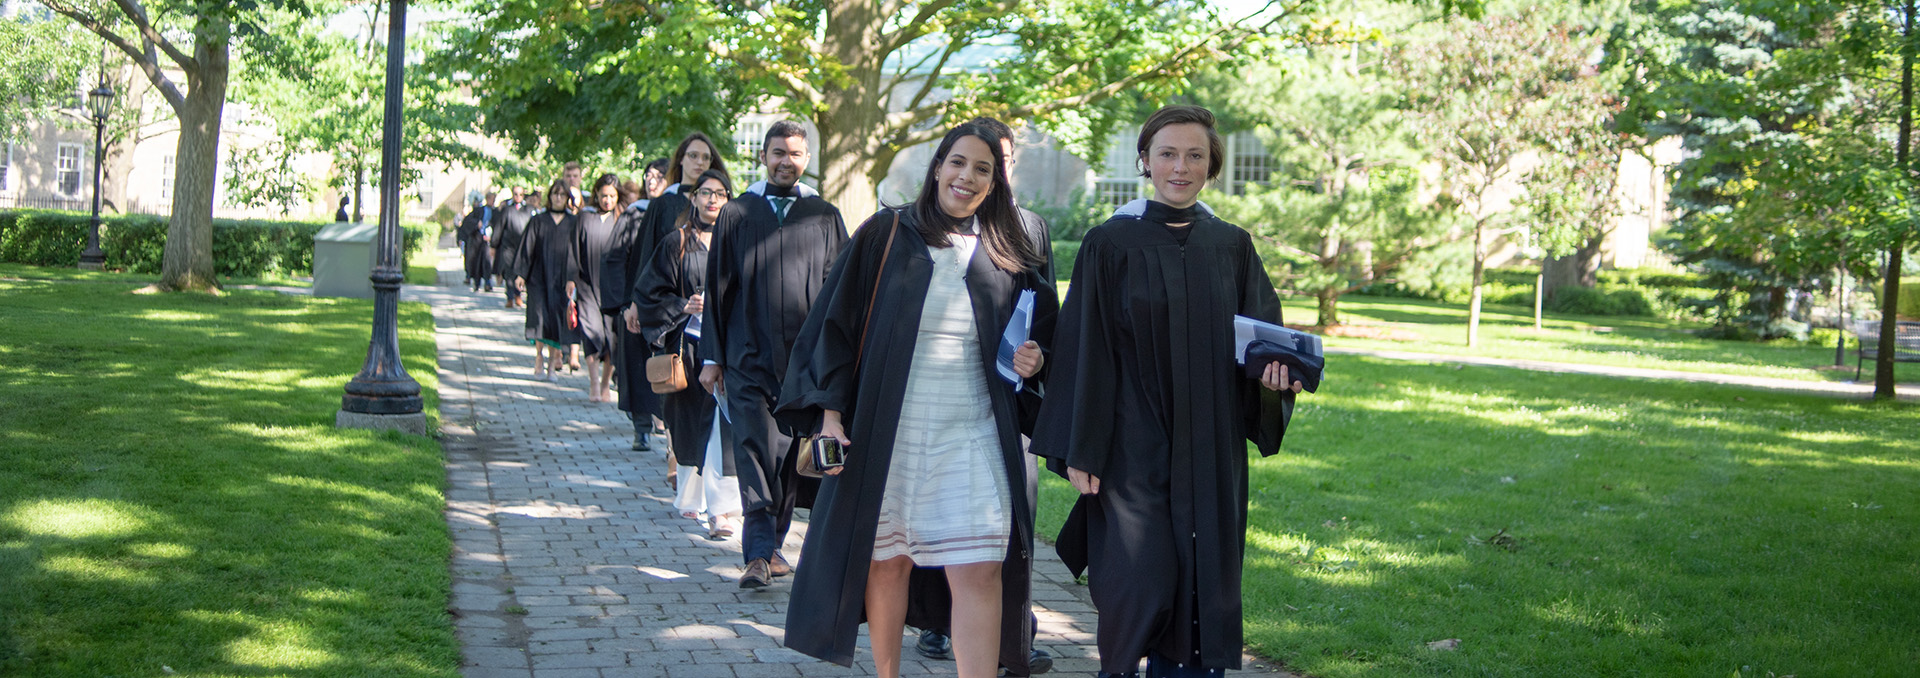 Graduands Process to Convocation Hall 2018